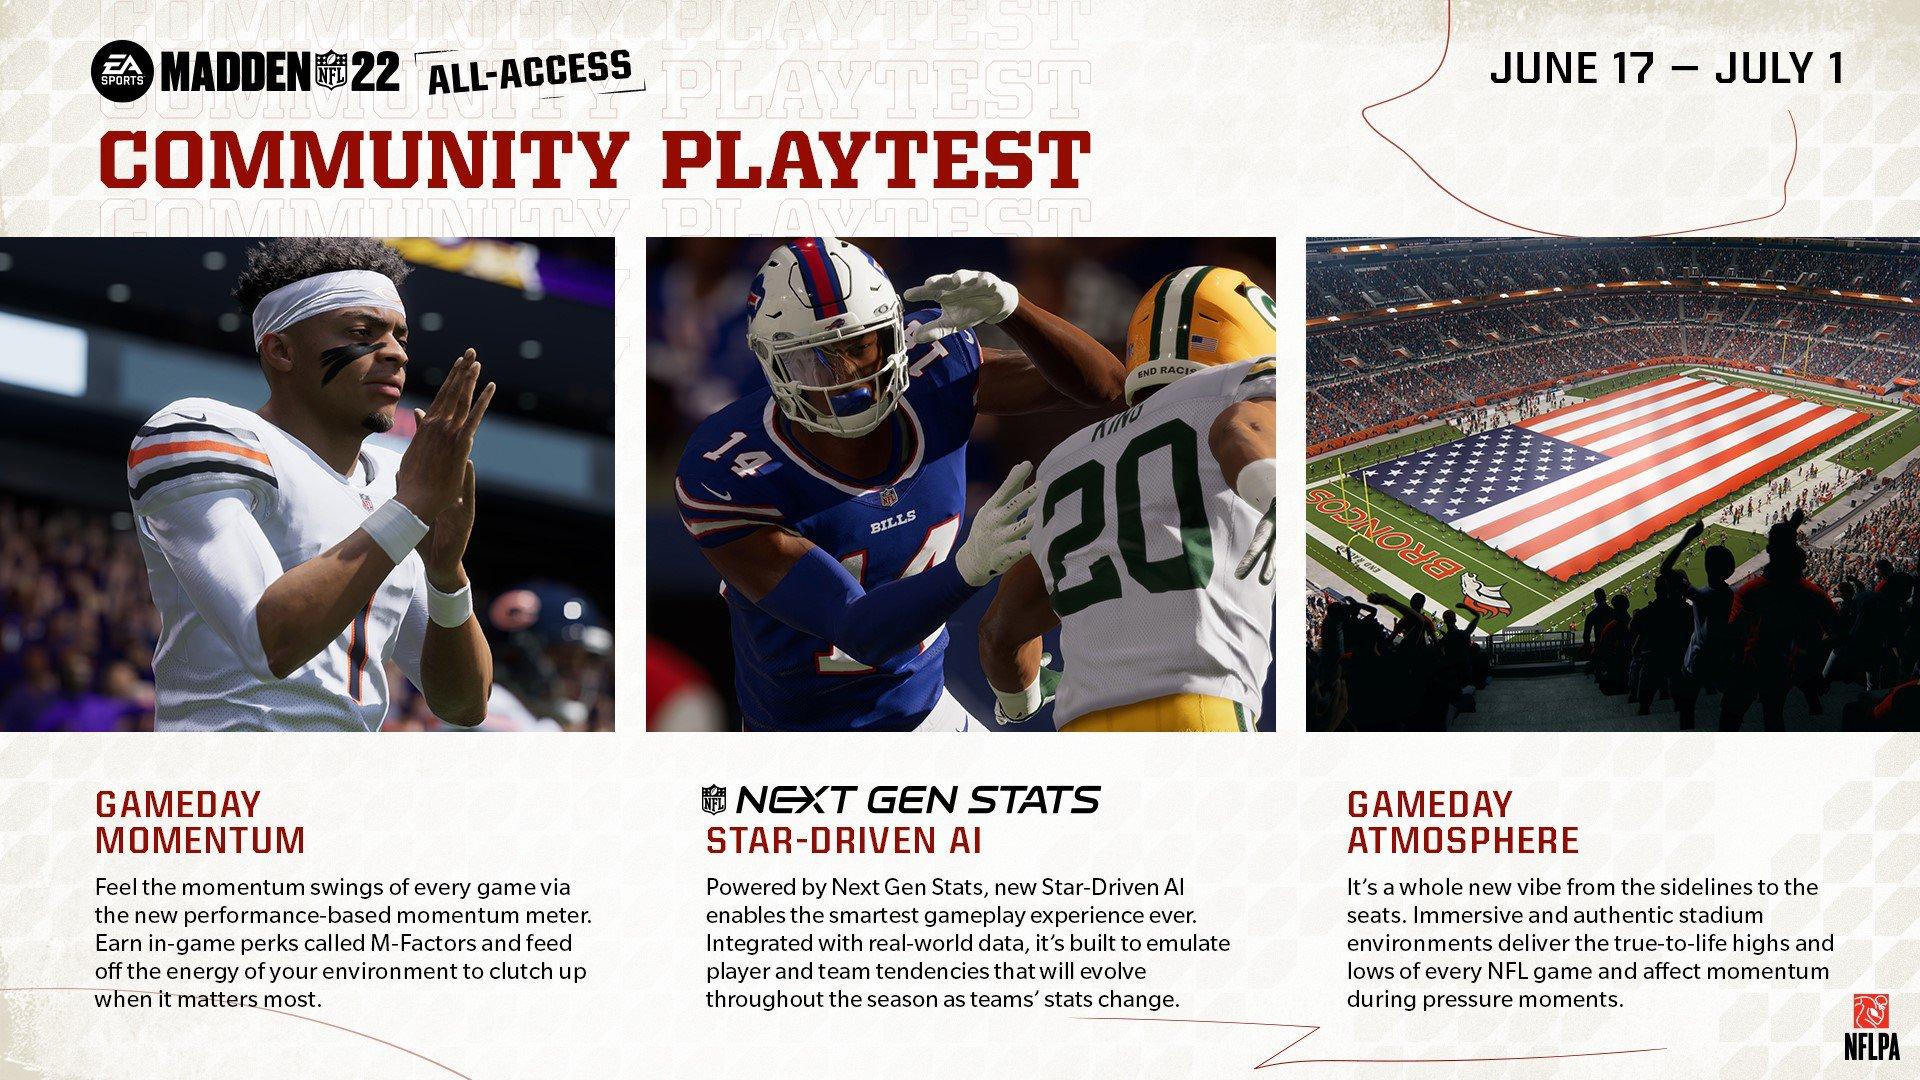 playtest-dates2.jpg